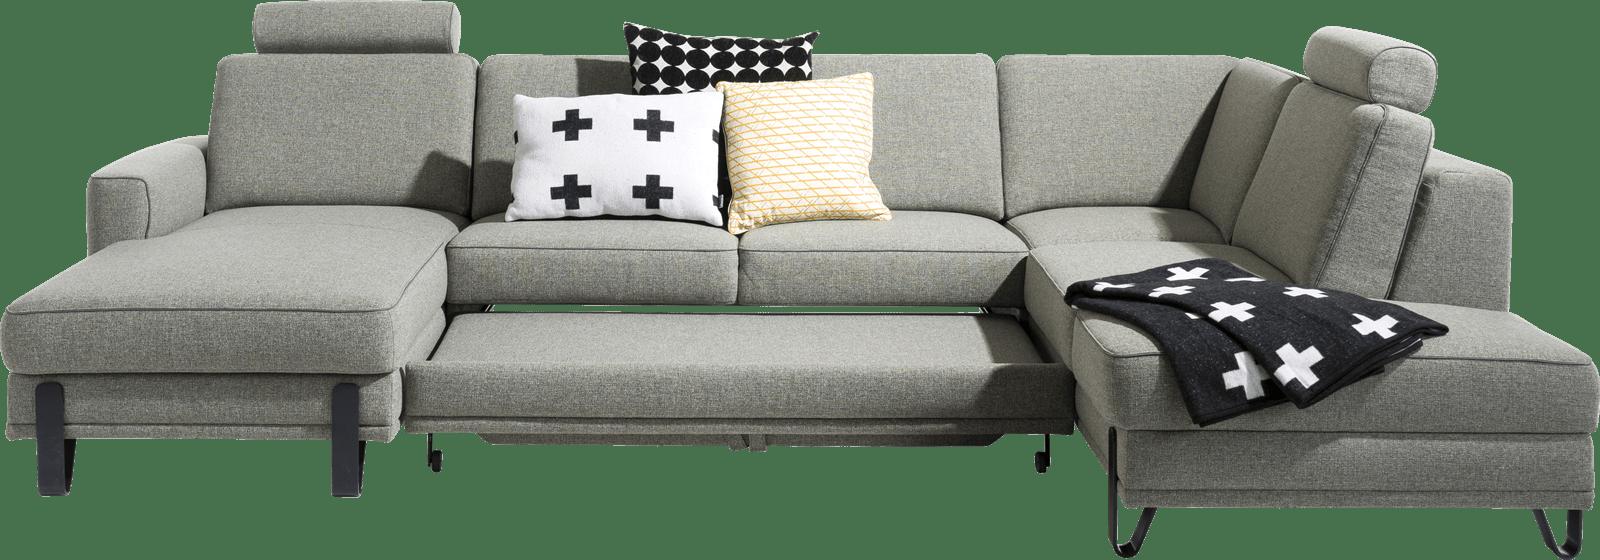 XOOON - Denver - Design minimaliste - appui-tete